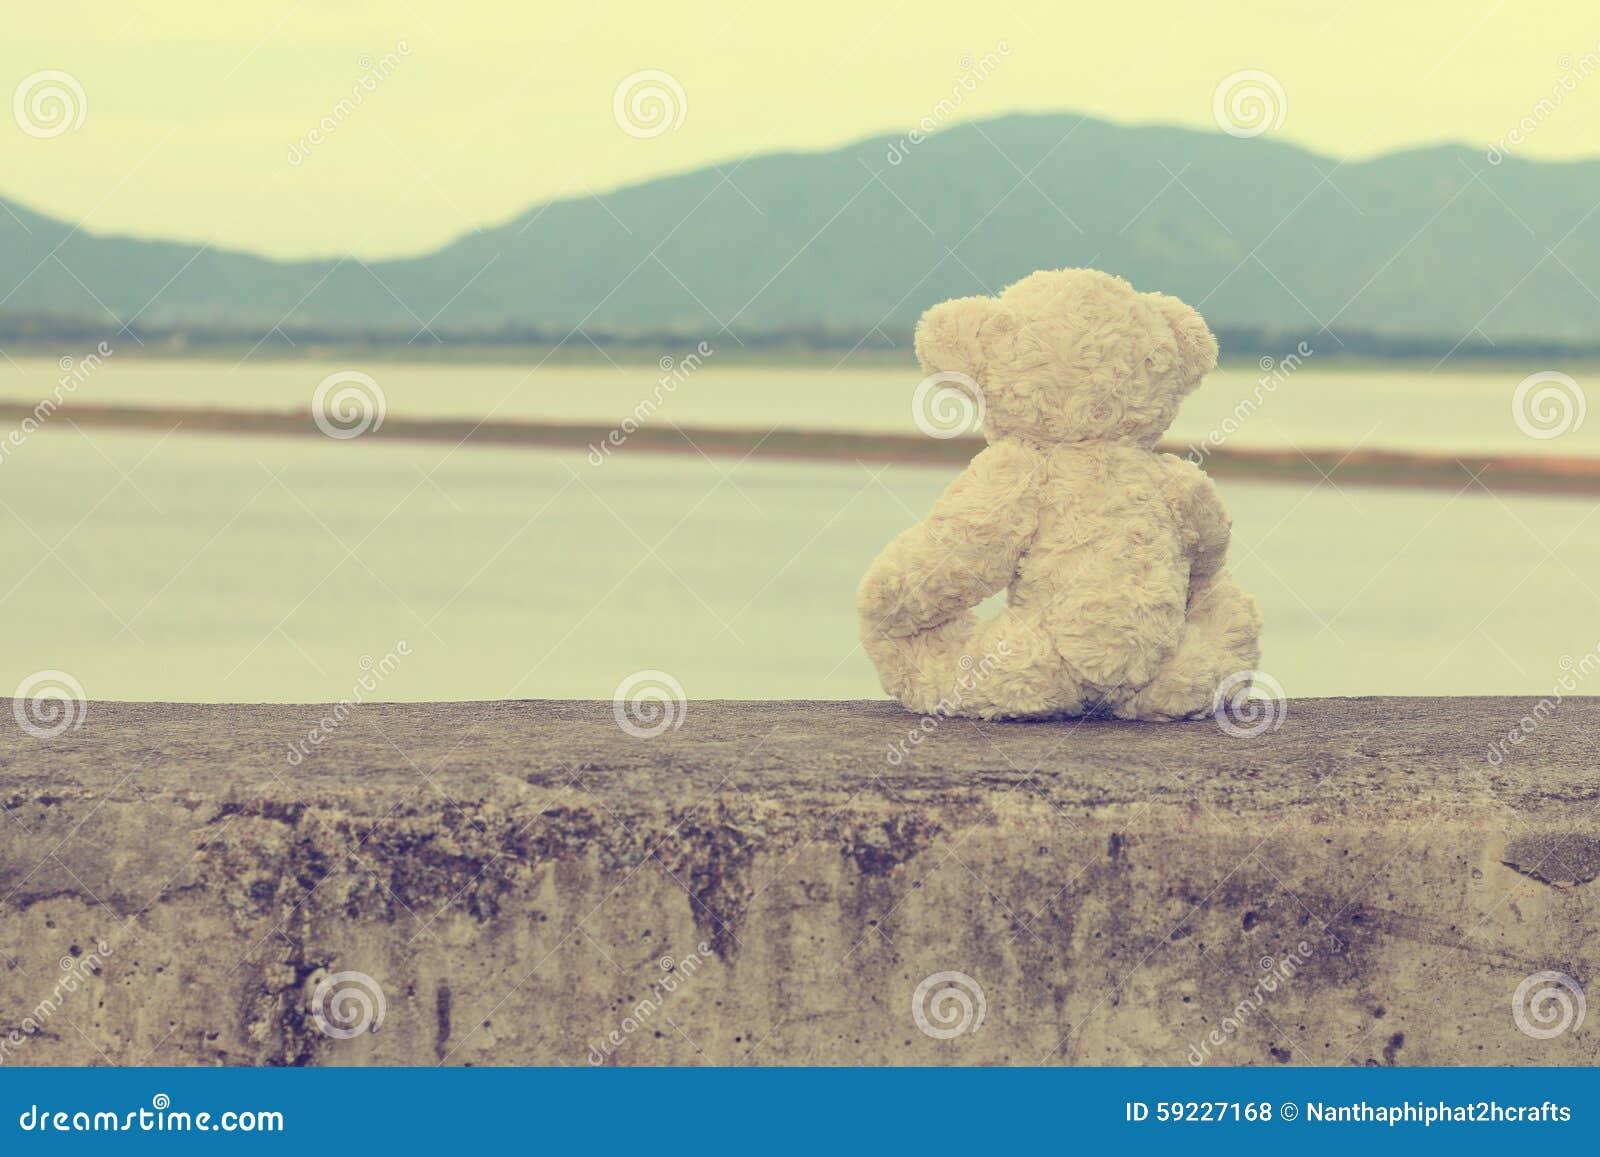 El oso de peluche se sienta esperándola Estilo de la vendimia